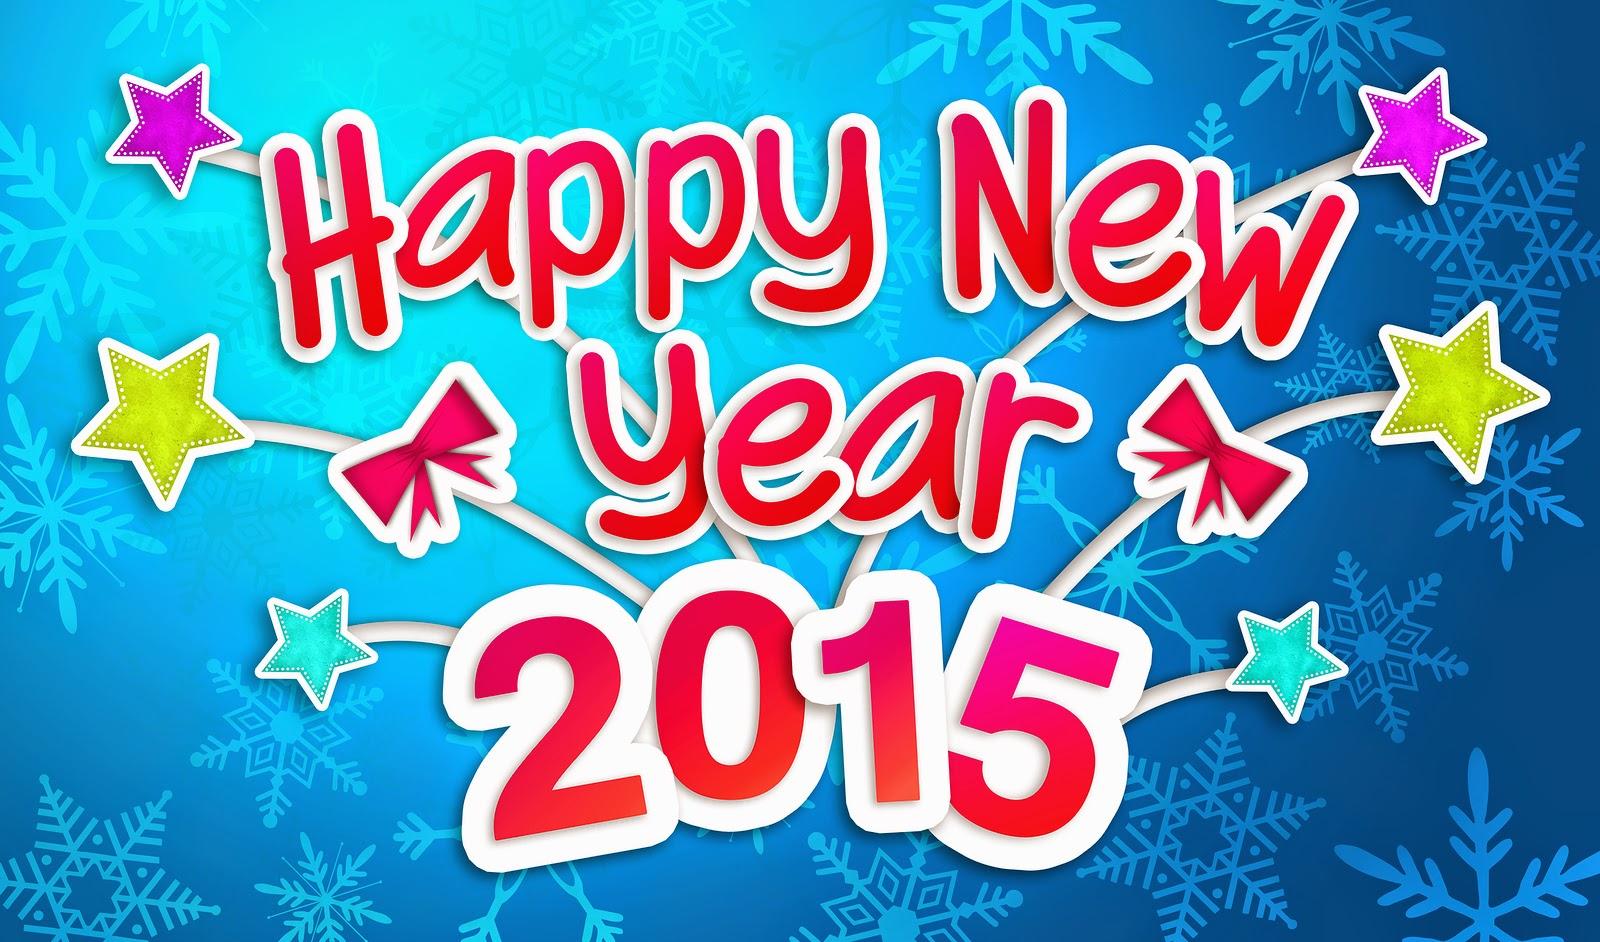 Happy New year 2015 wishing greeting card